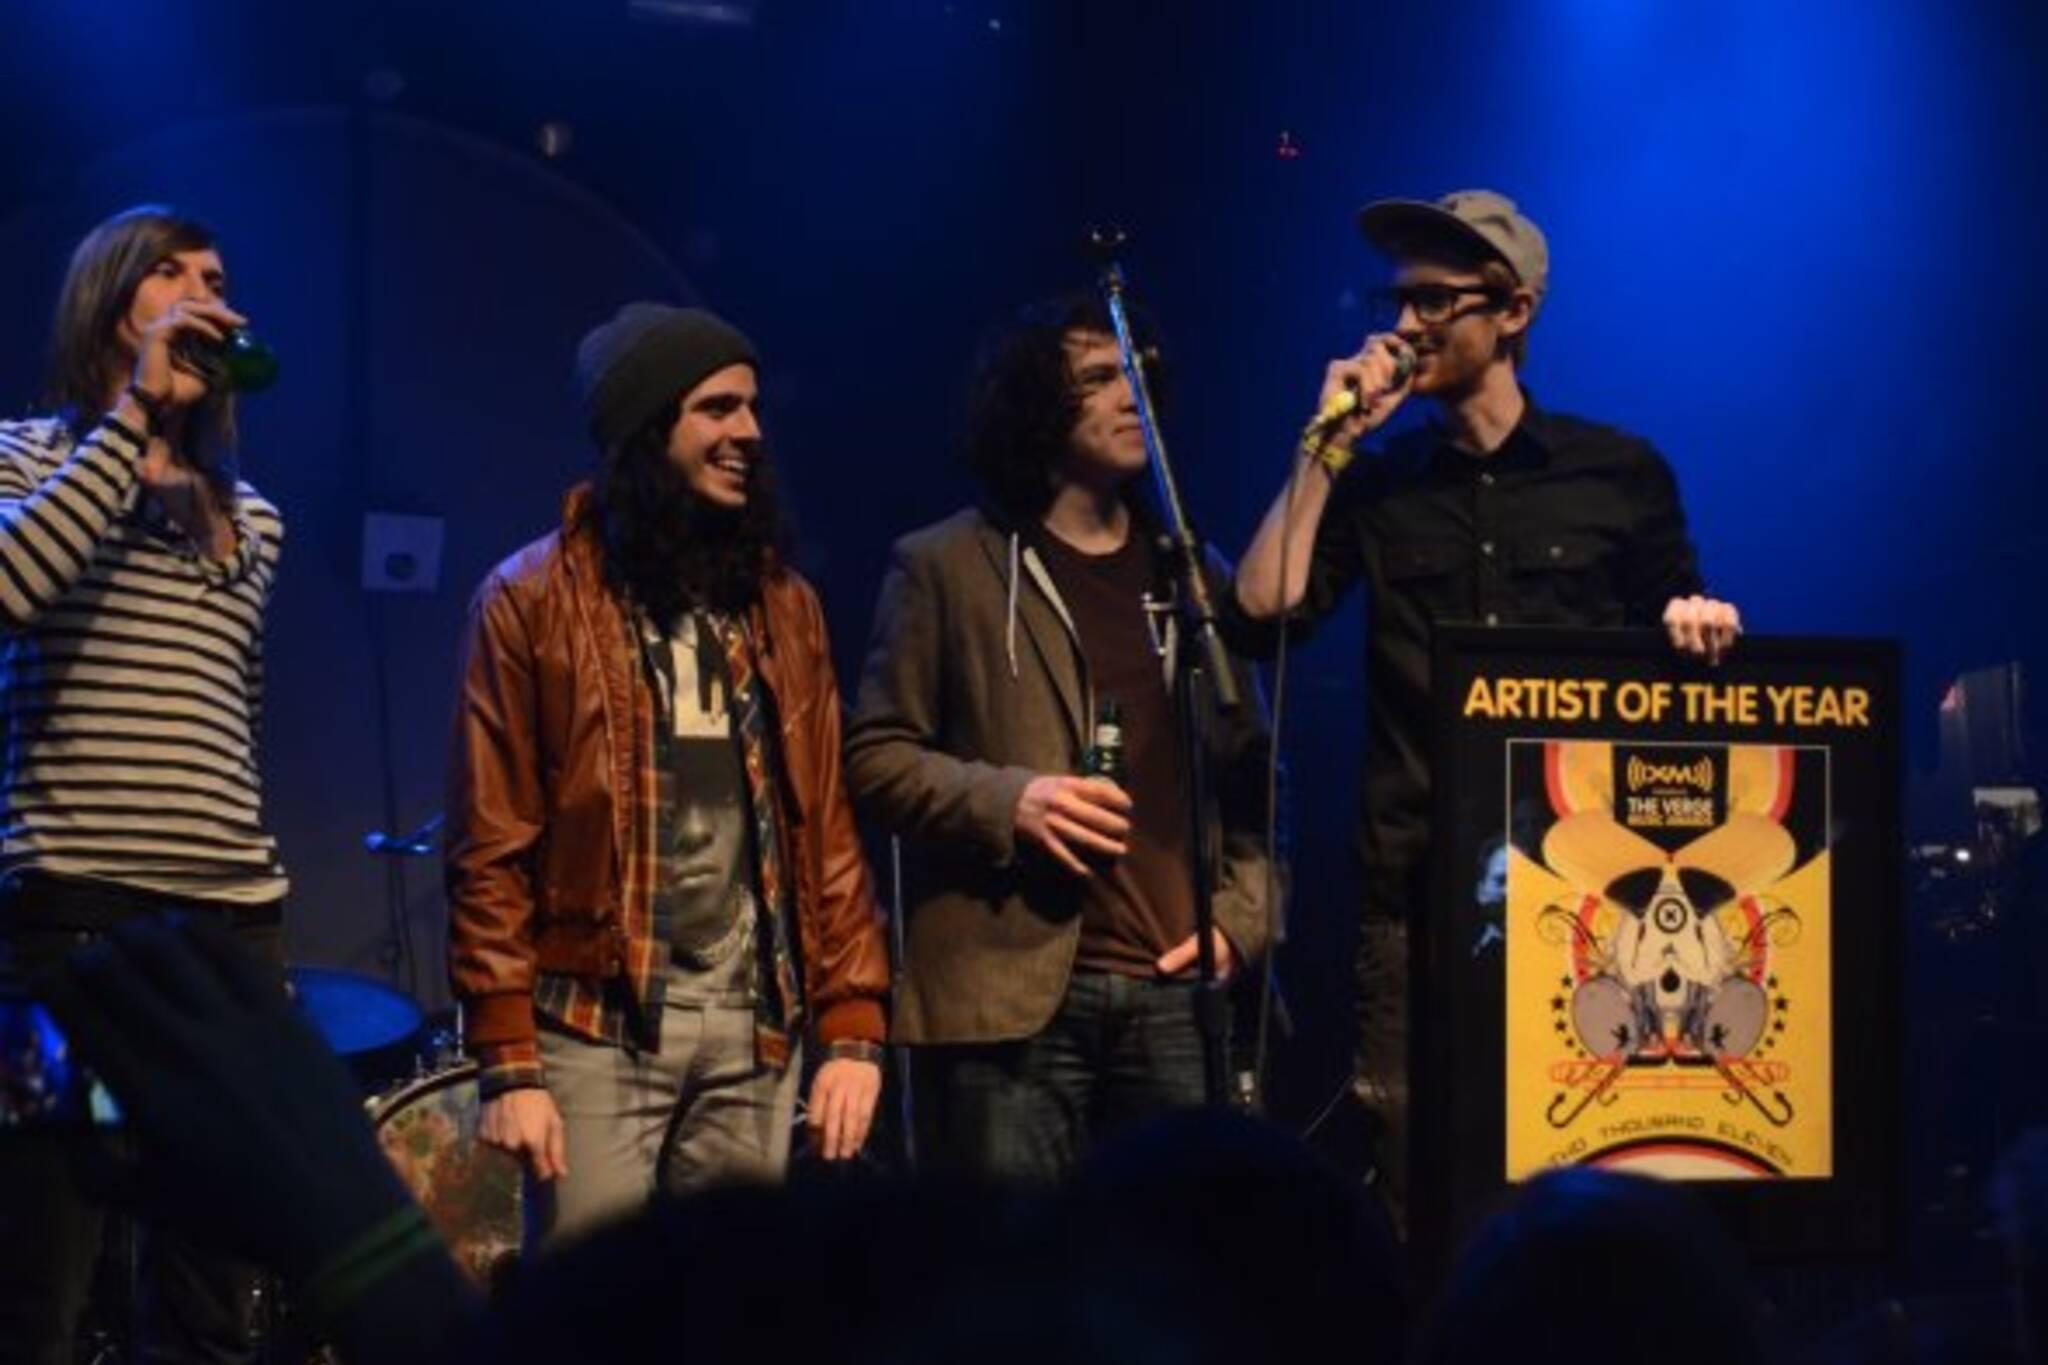 Verge Music Awards